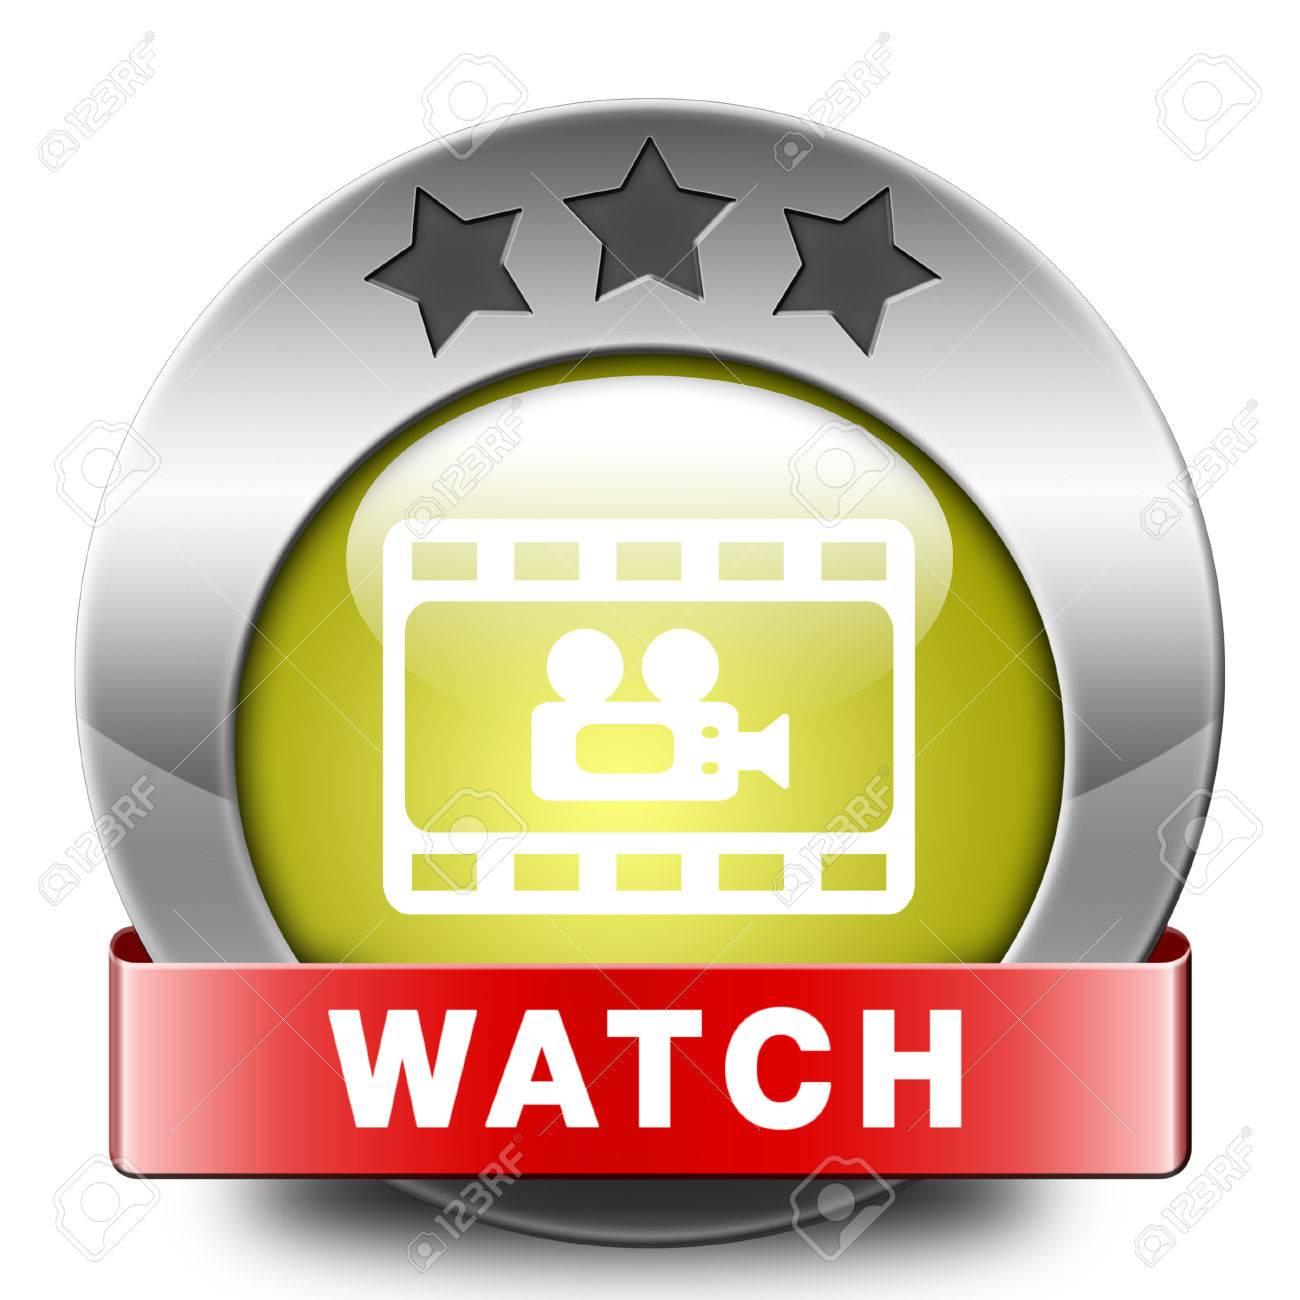 Watch the clip watch video online 87